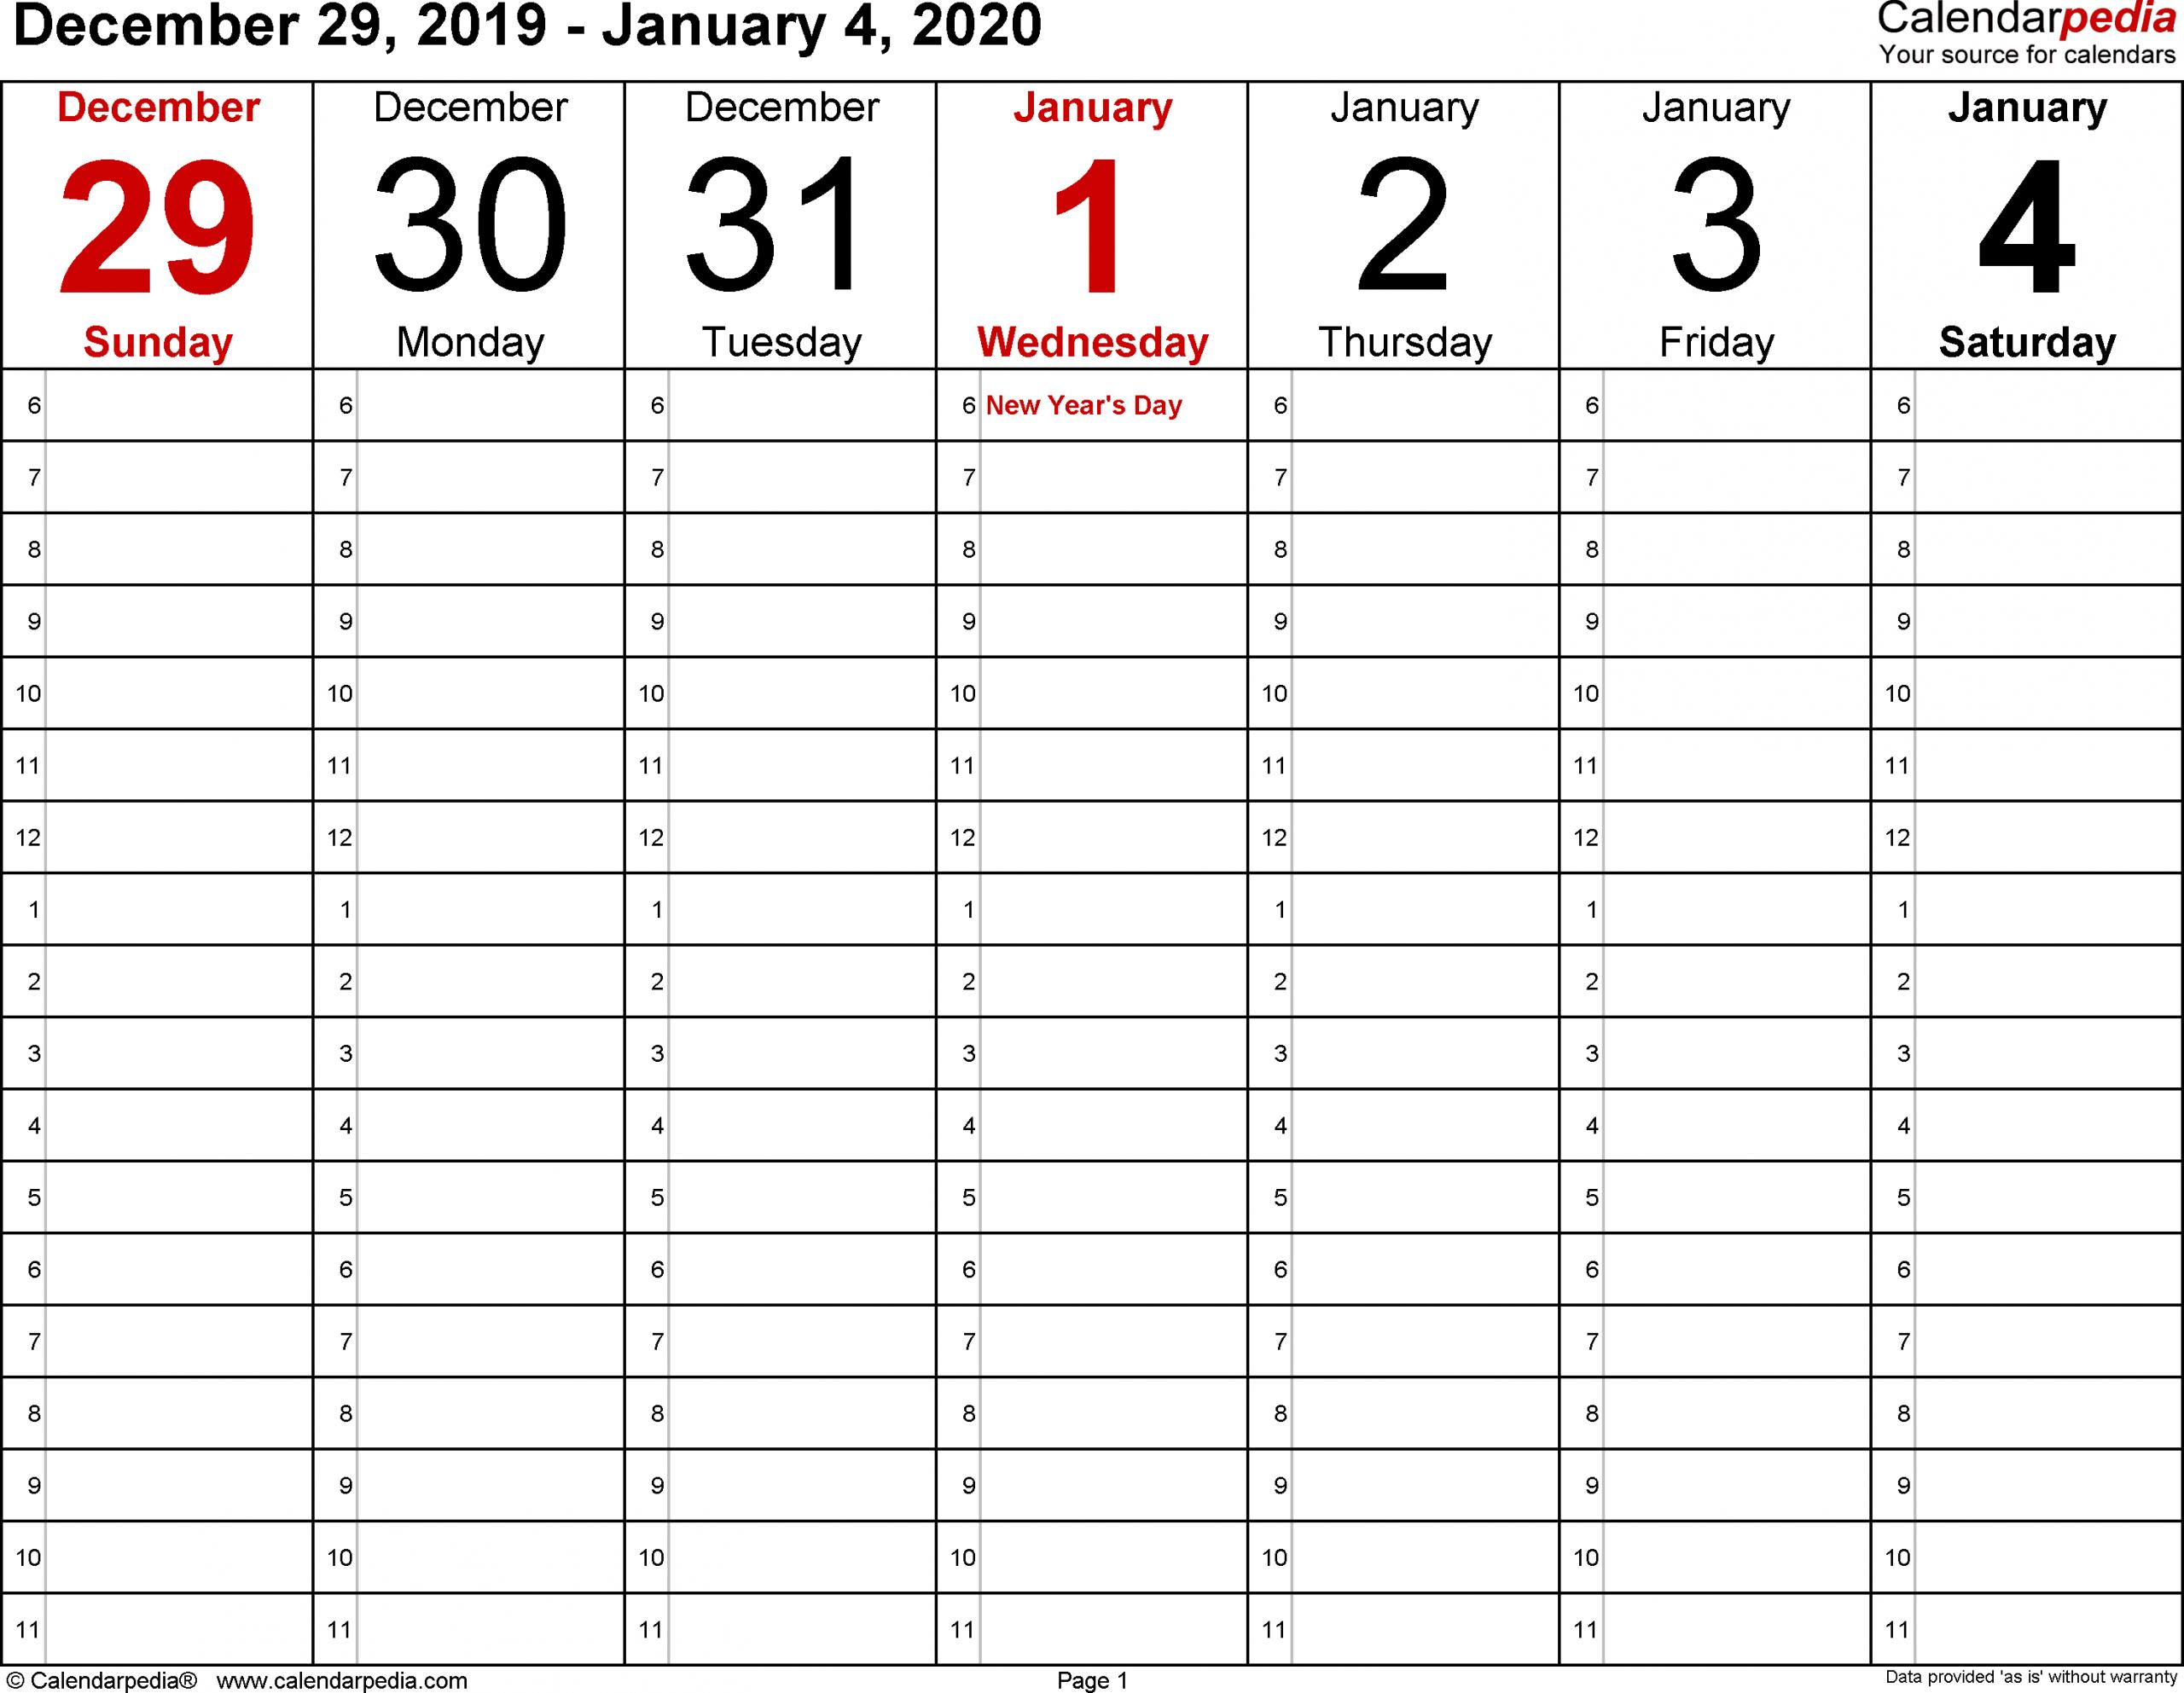 January 2020 Weekly Calendar | Calendar 2019 Template